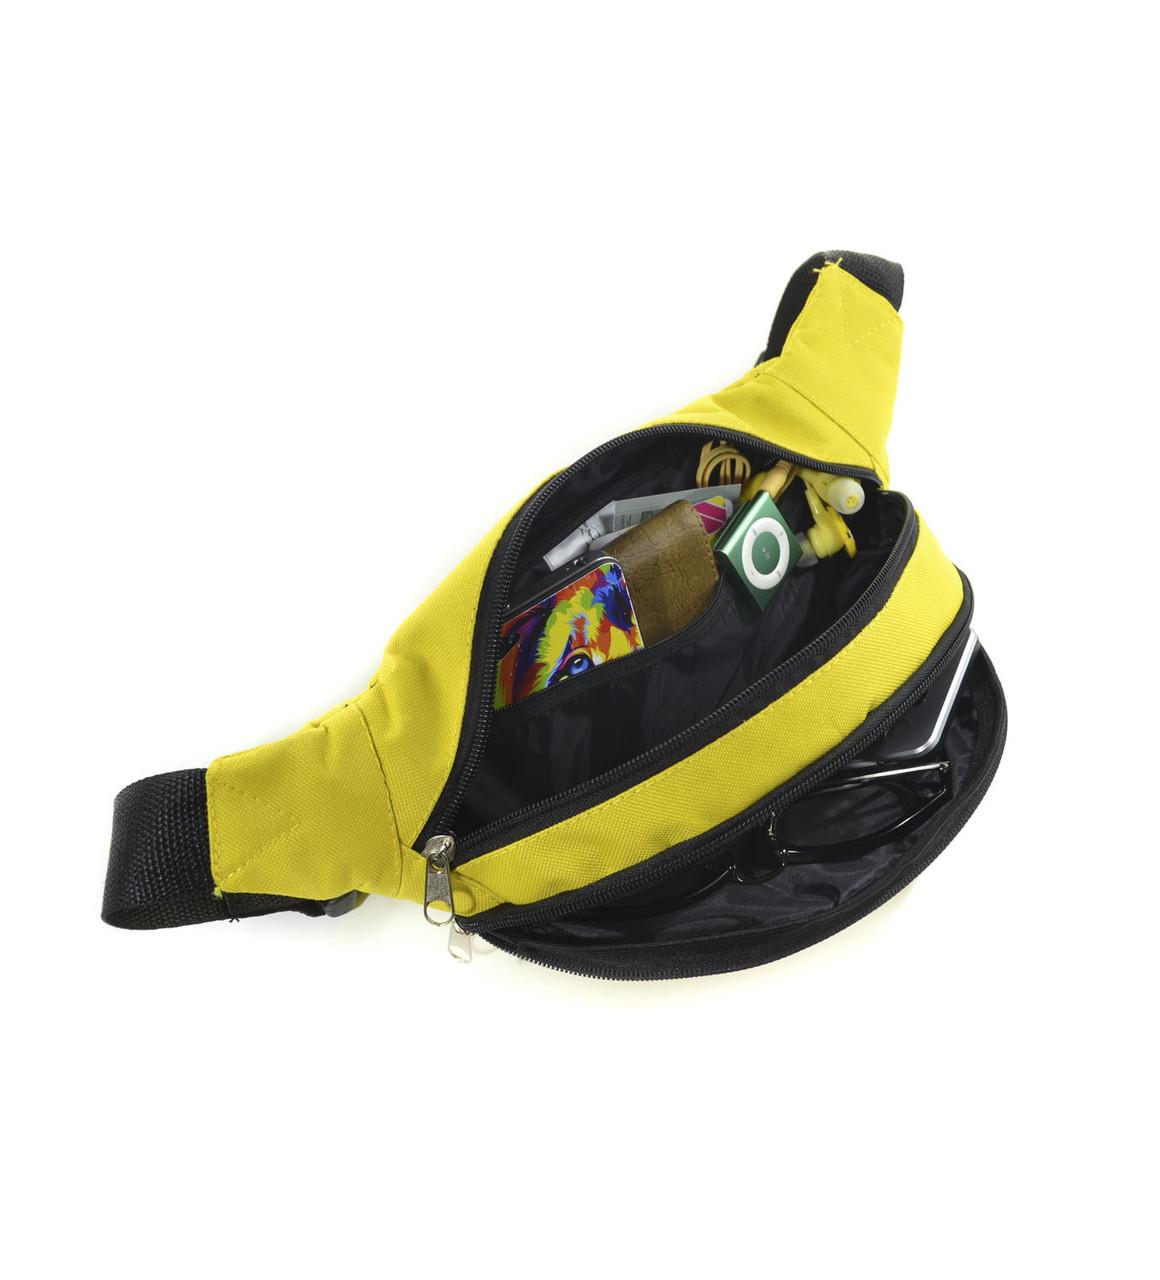 d2ee081d0a8b Поясная сумка бананка желтая Banan Surikat (сумка на пояс, сумки, сумк 2 ...